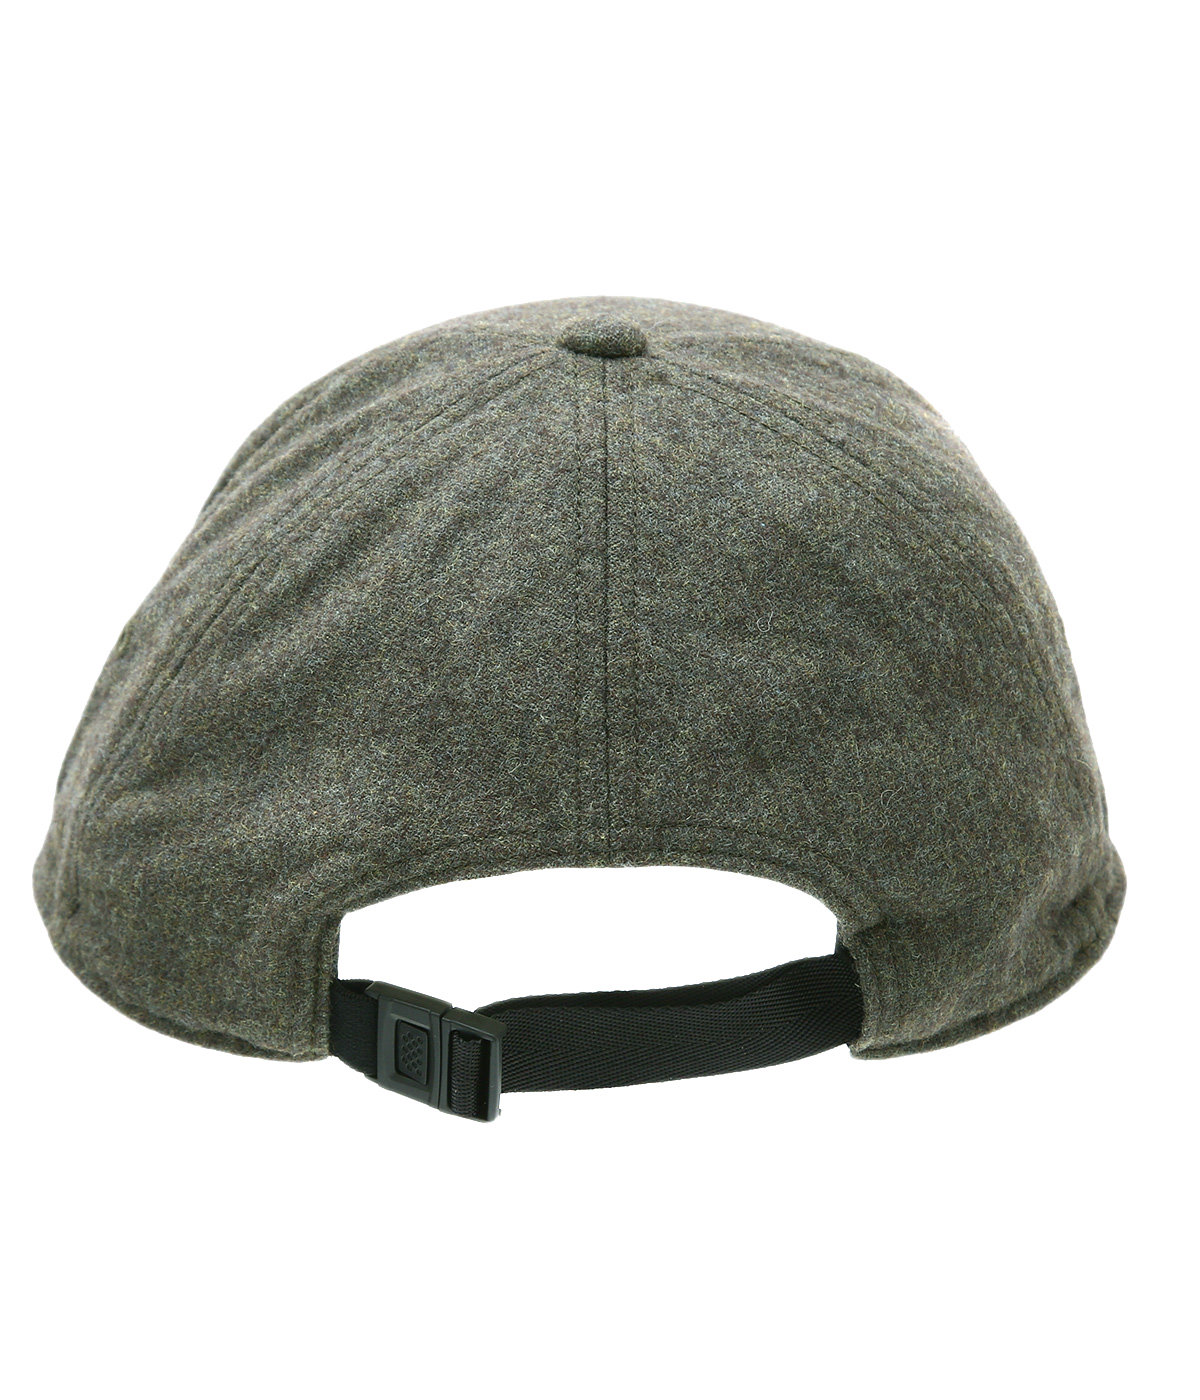 7 Panel Wool Ball Cap